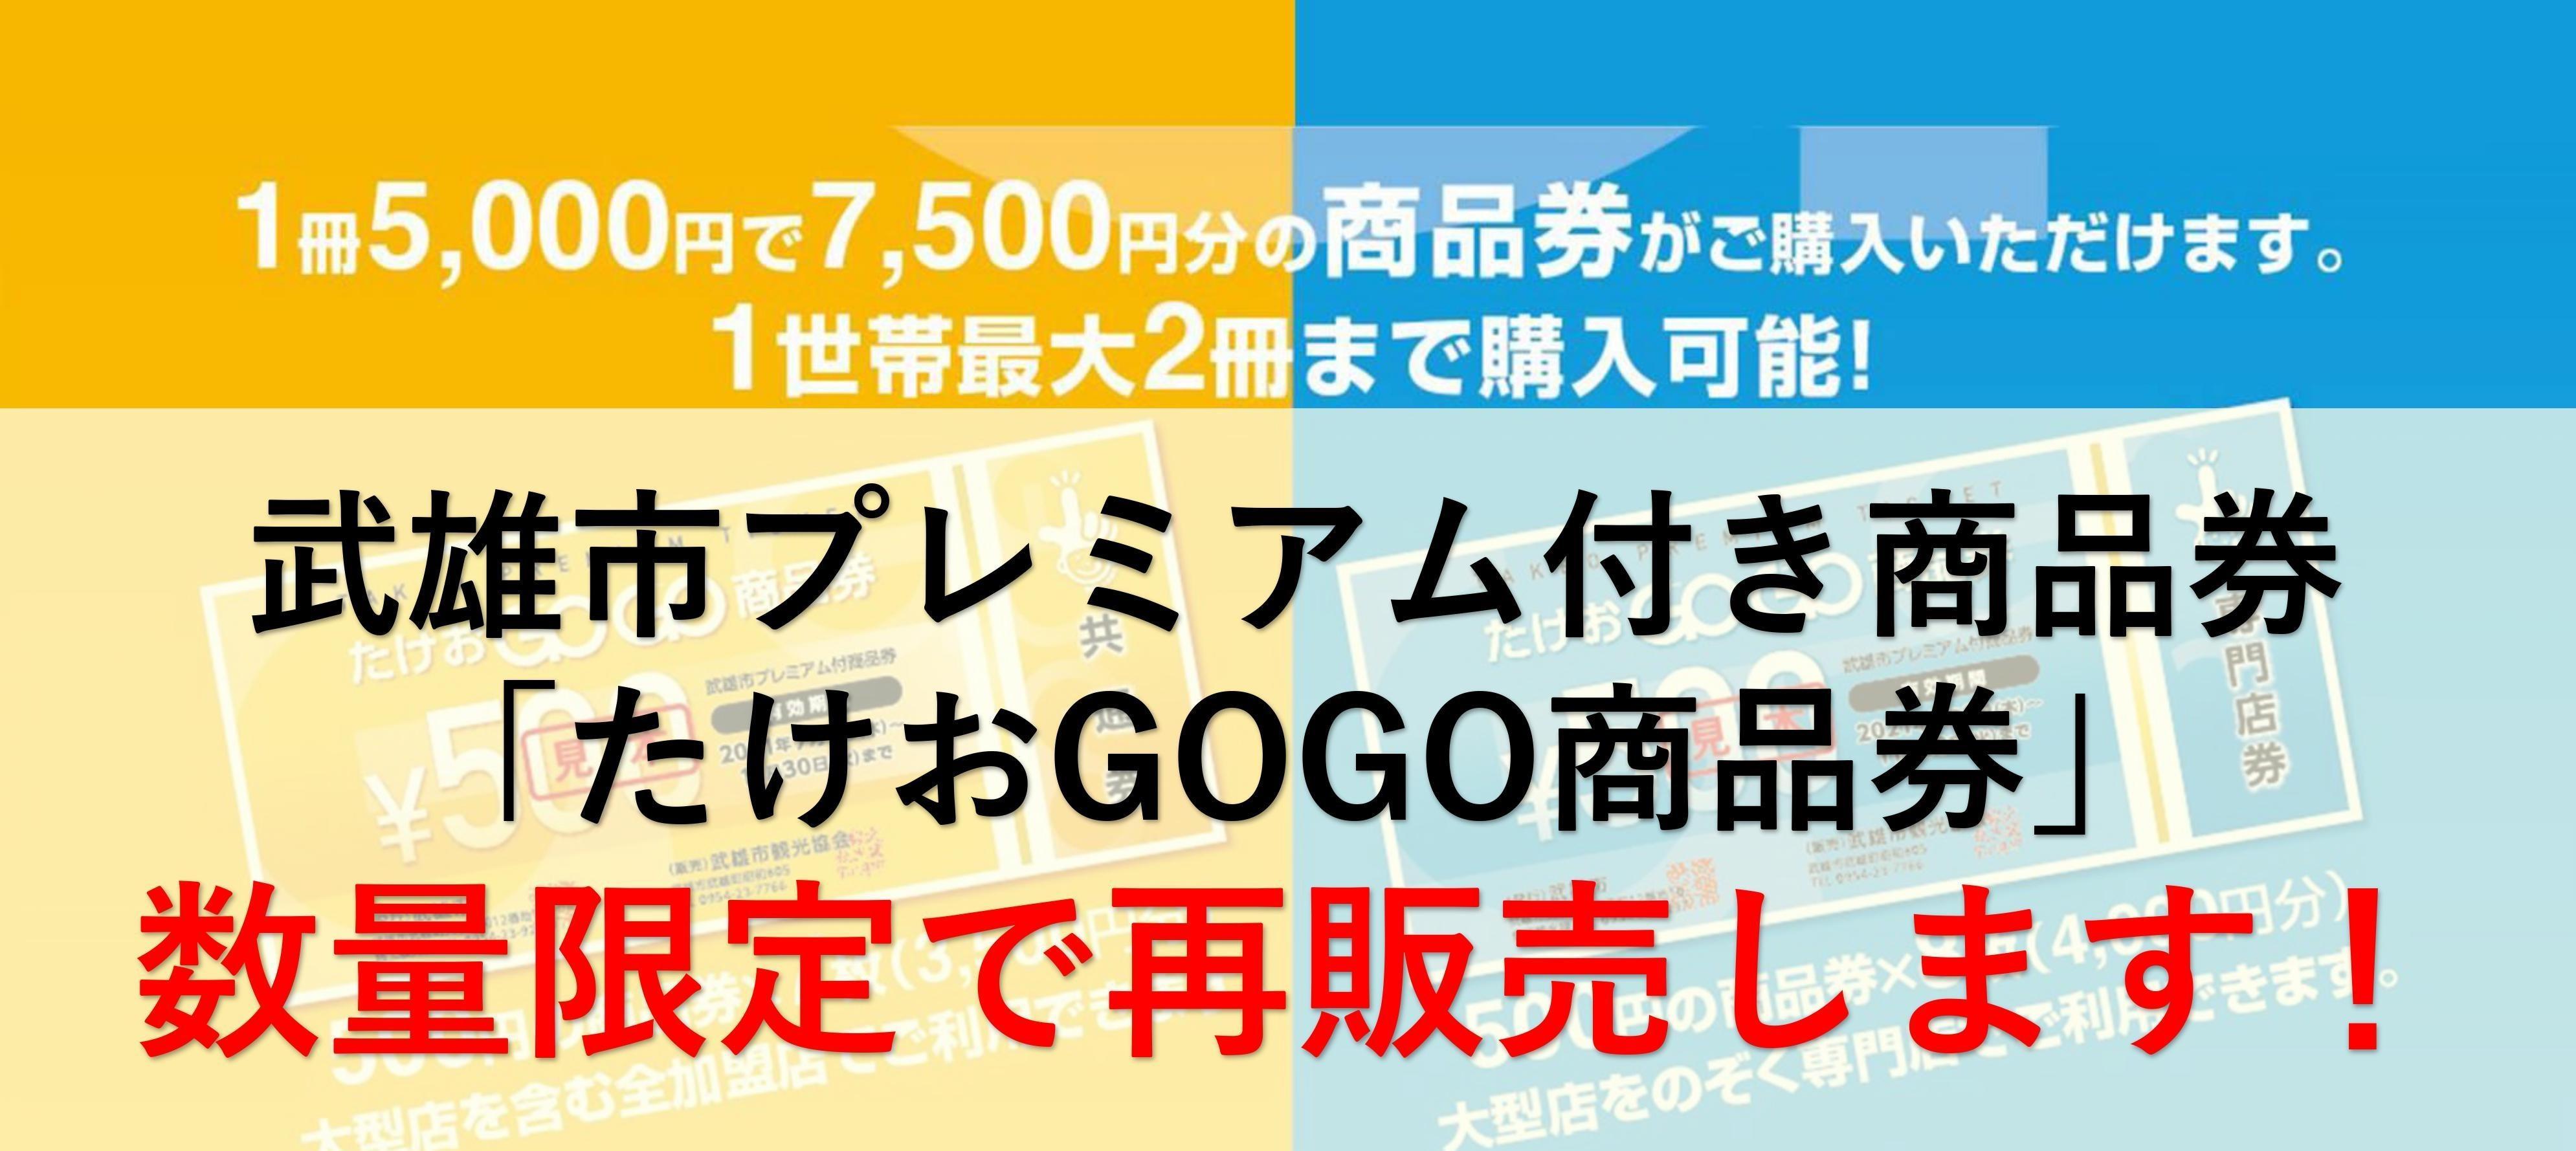 http://www.takeo-kk.net/news/uploads/0001.jpg